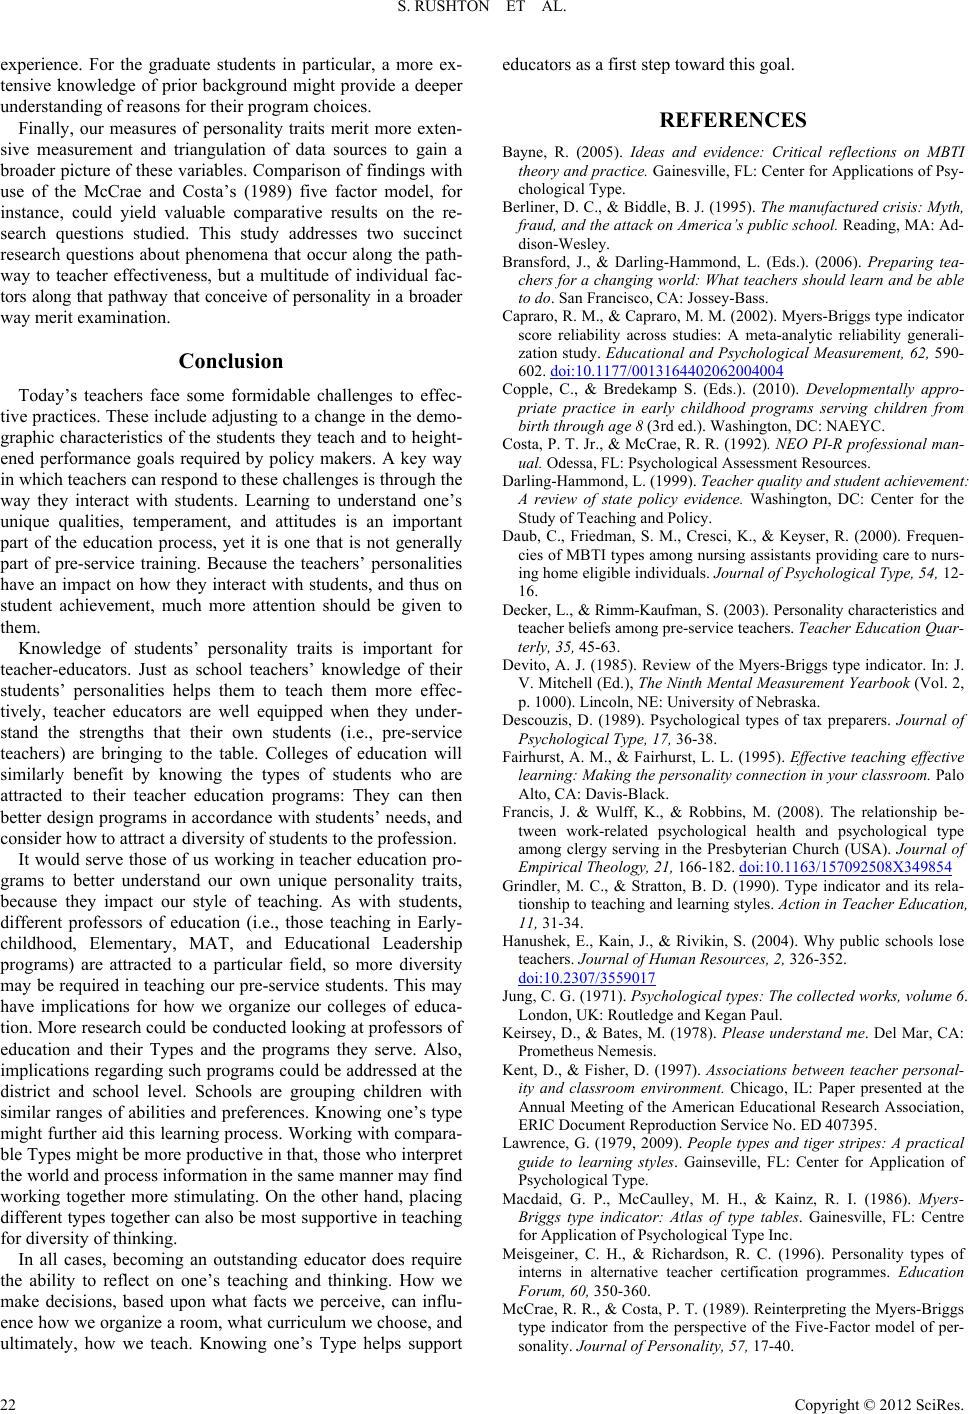 Leibniz essays on human understanding